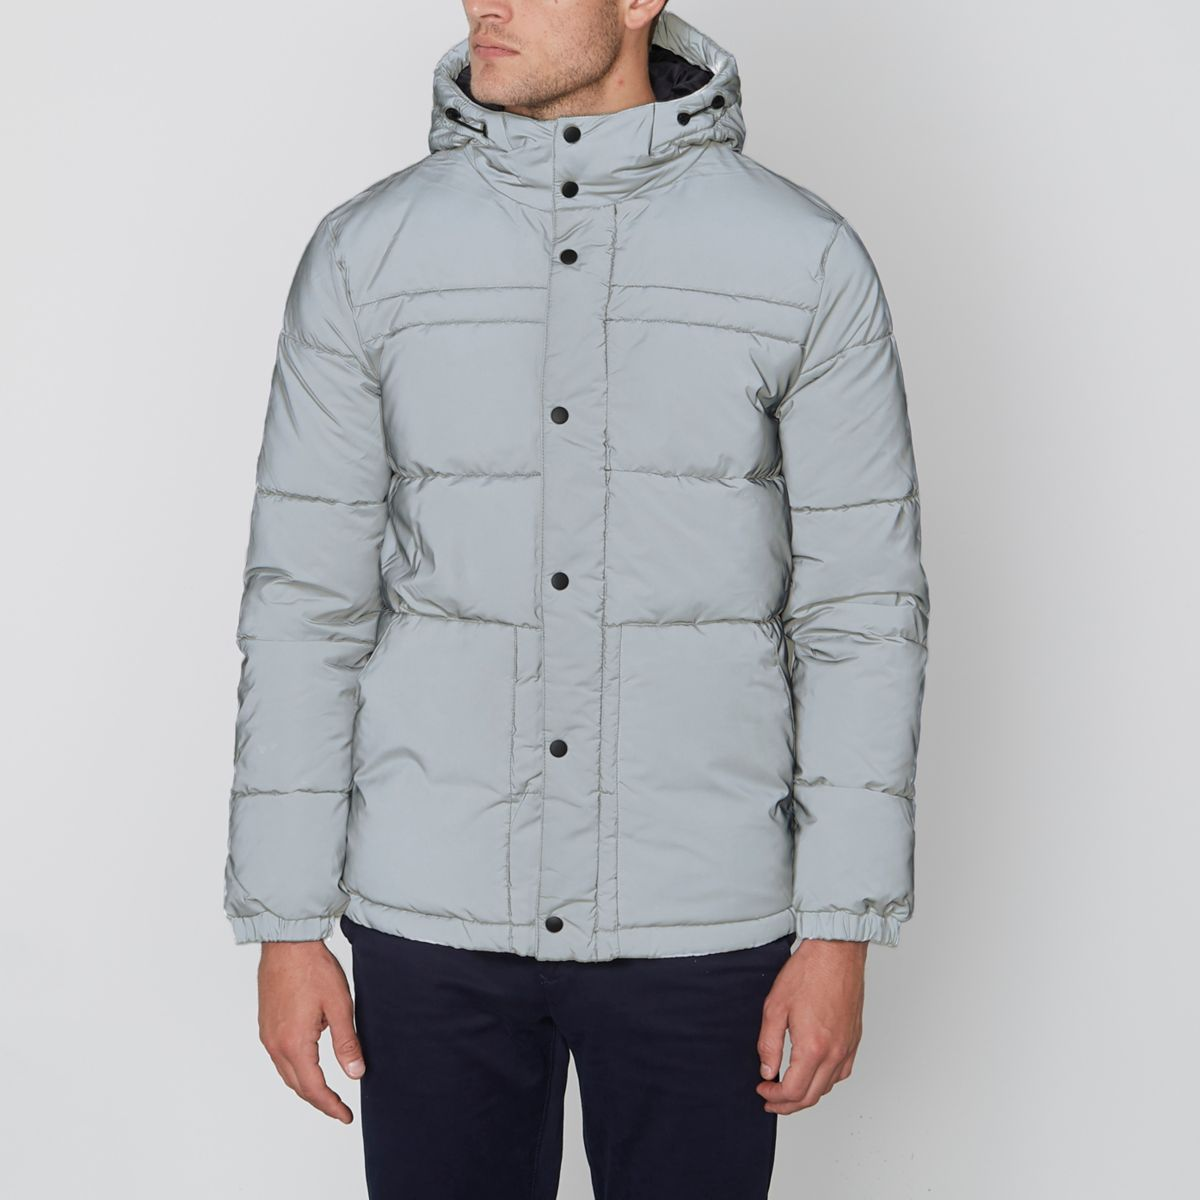 Jack & Jones Core grey reflective jacket